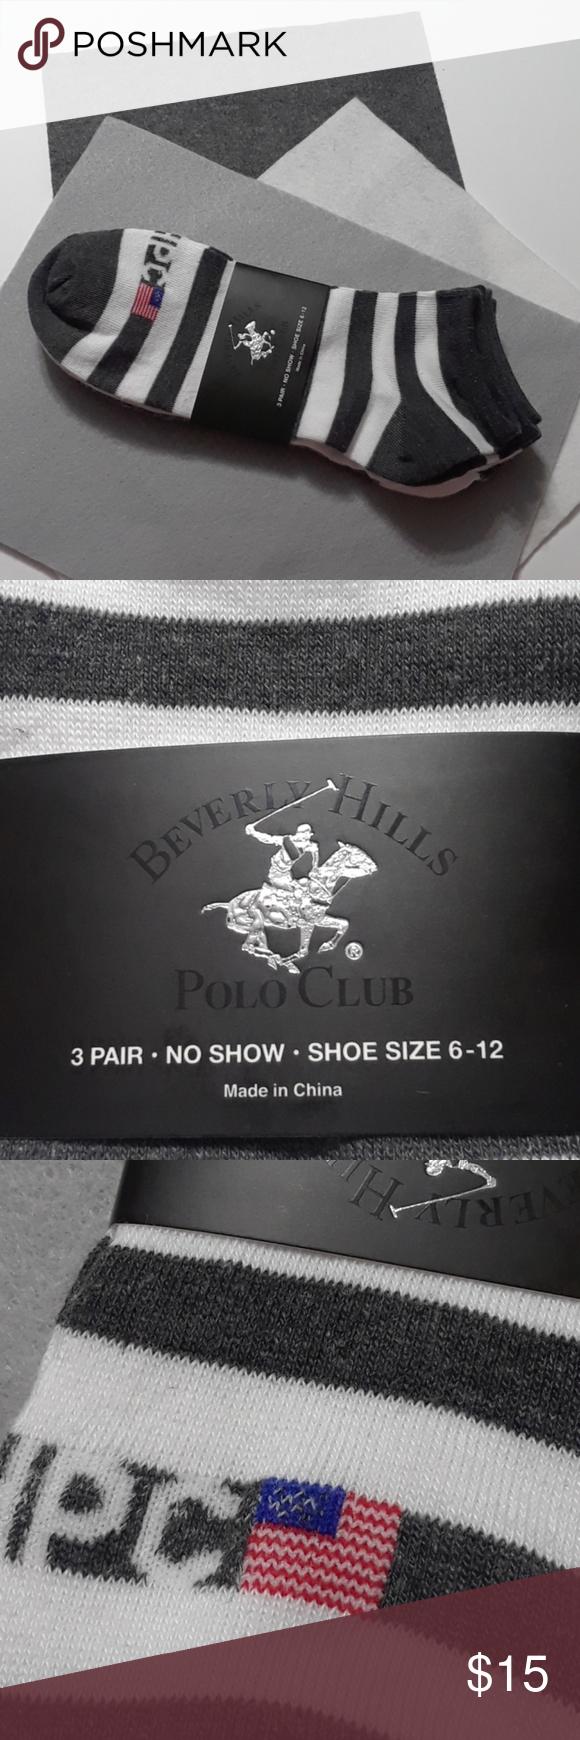 Beverly Hills Polo Club 3 Pair No Show Socks Beverly Hills Polo Club No Show Socks Polo Club